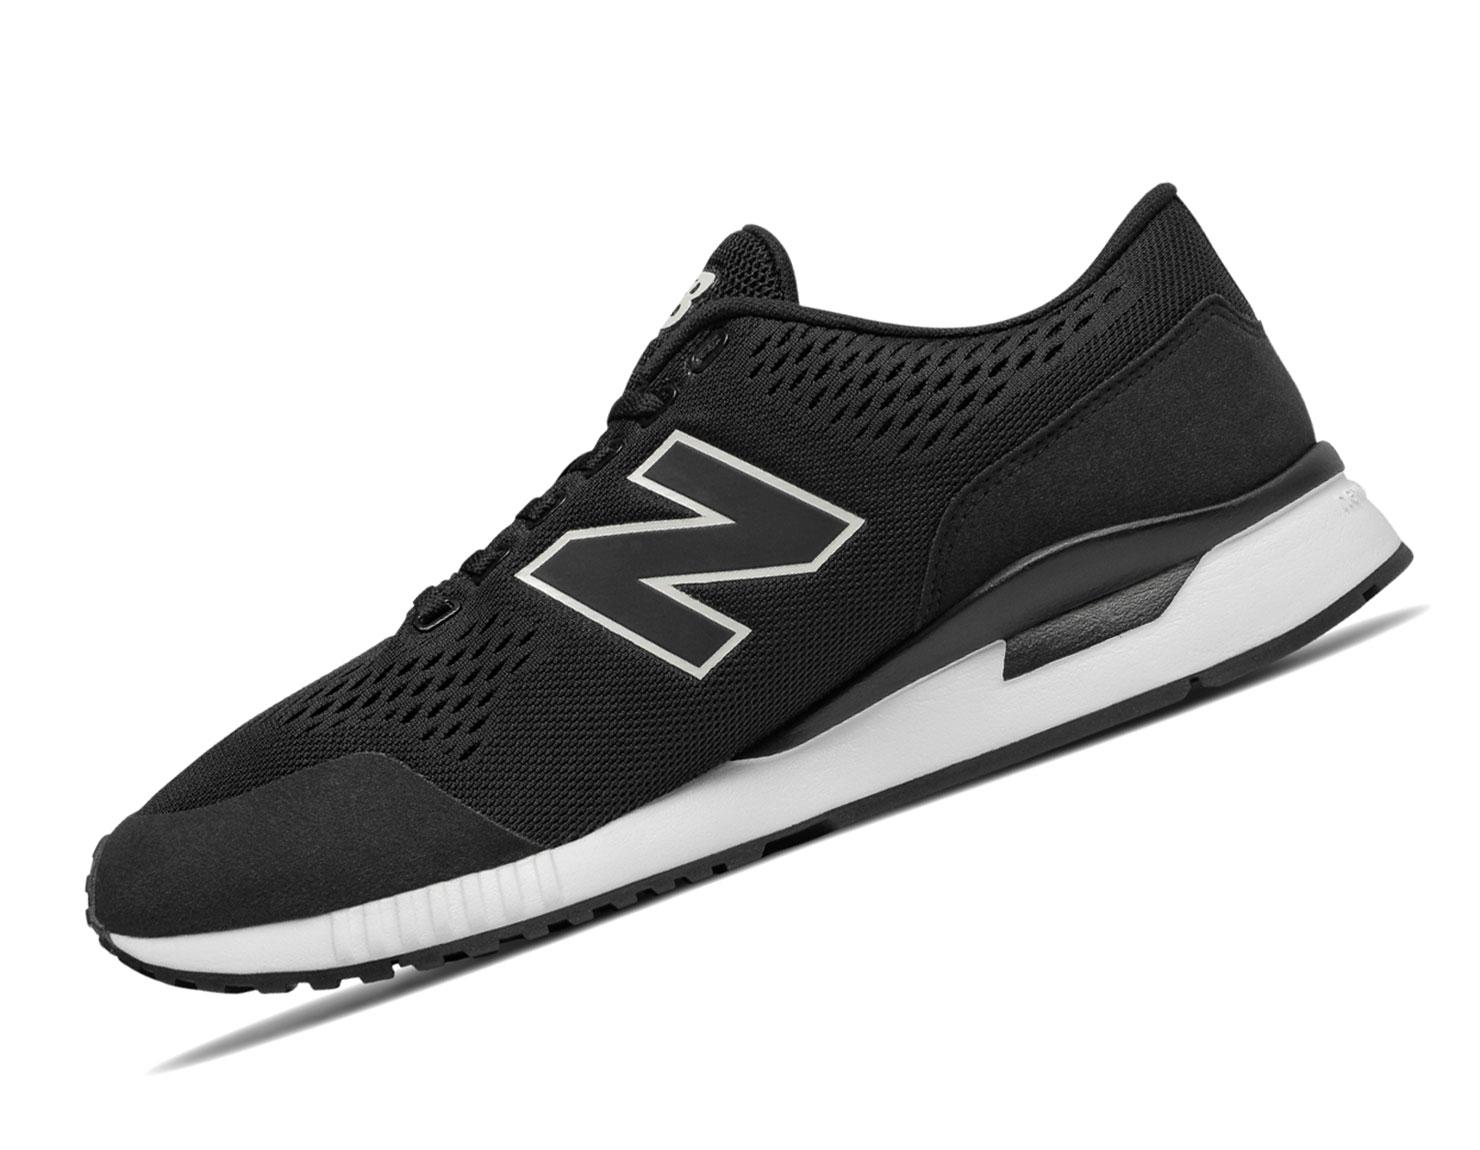 f85f60624a6e25 New Balance 005 Sneaker MRL005BB Schwarz Herren Retro Lifestyle Sportschuhe  Neu